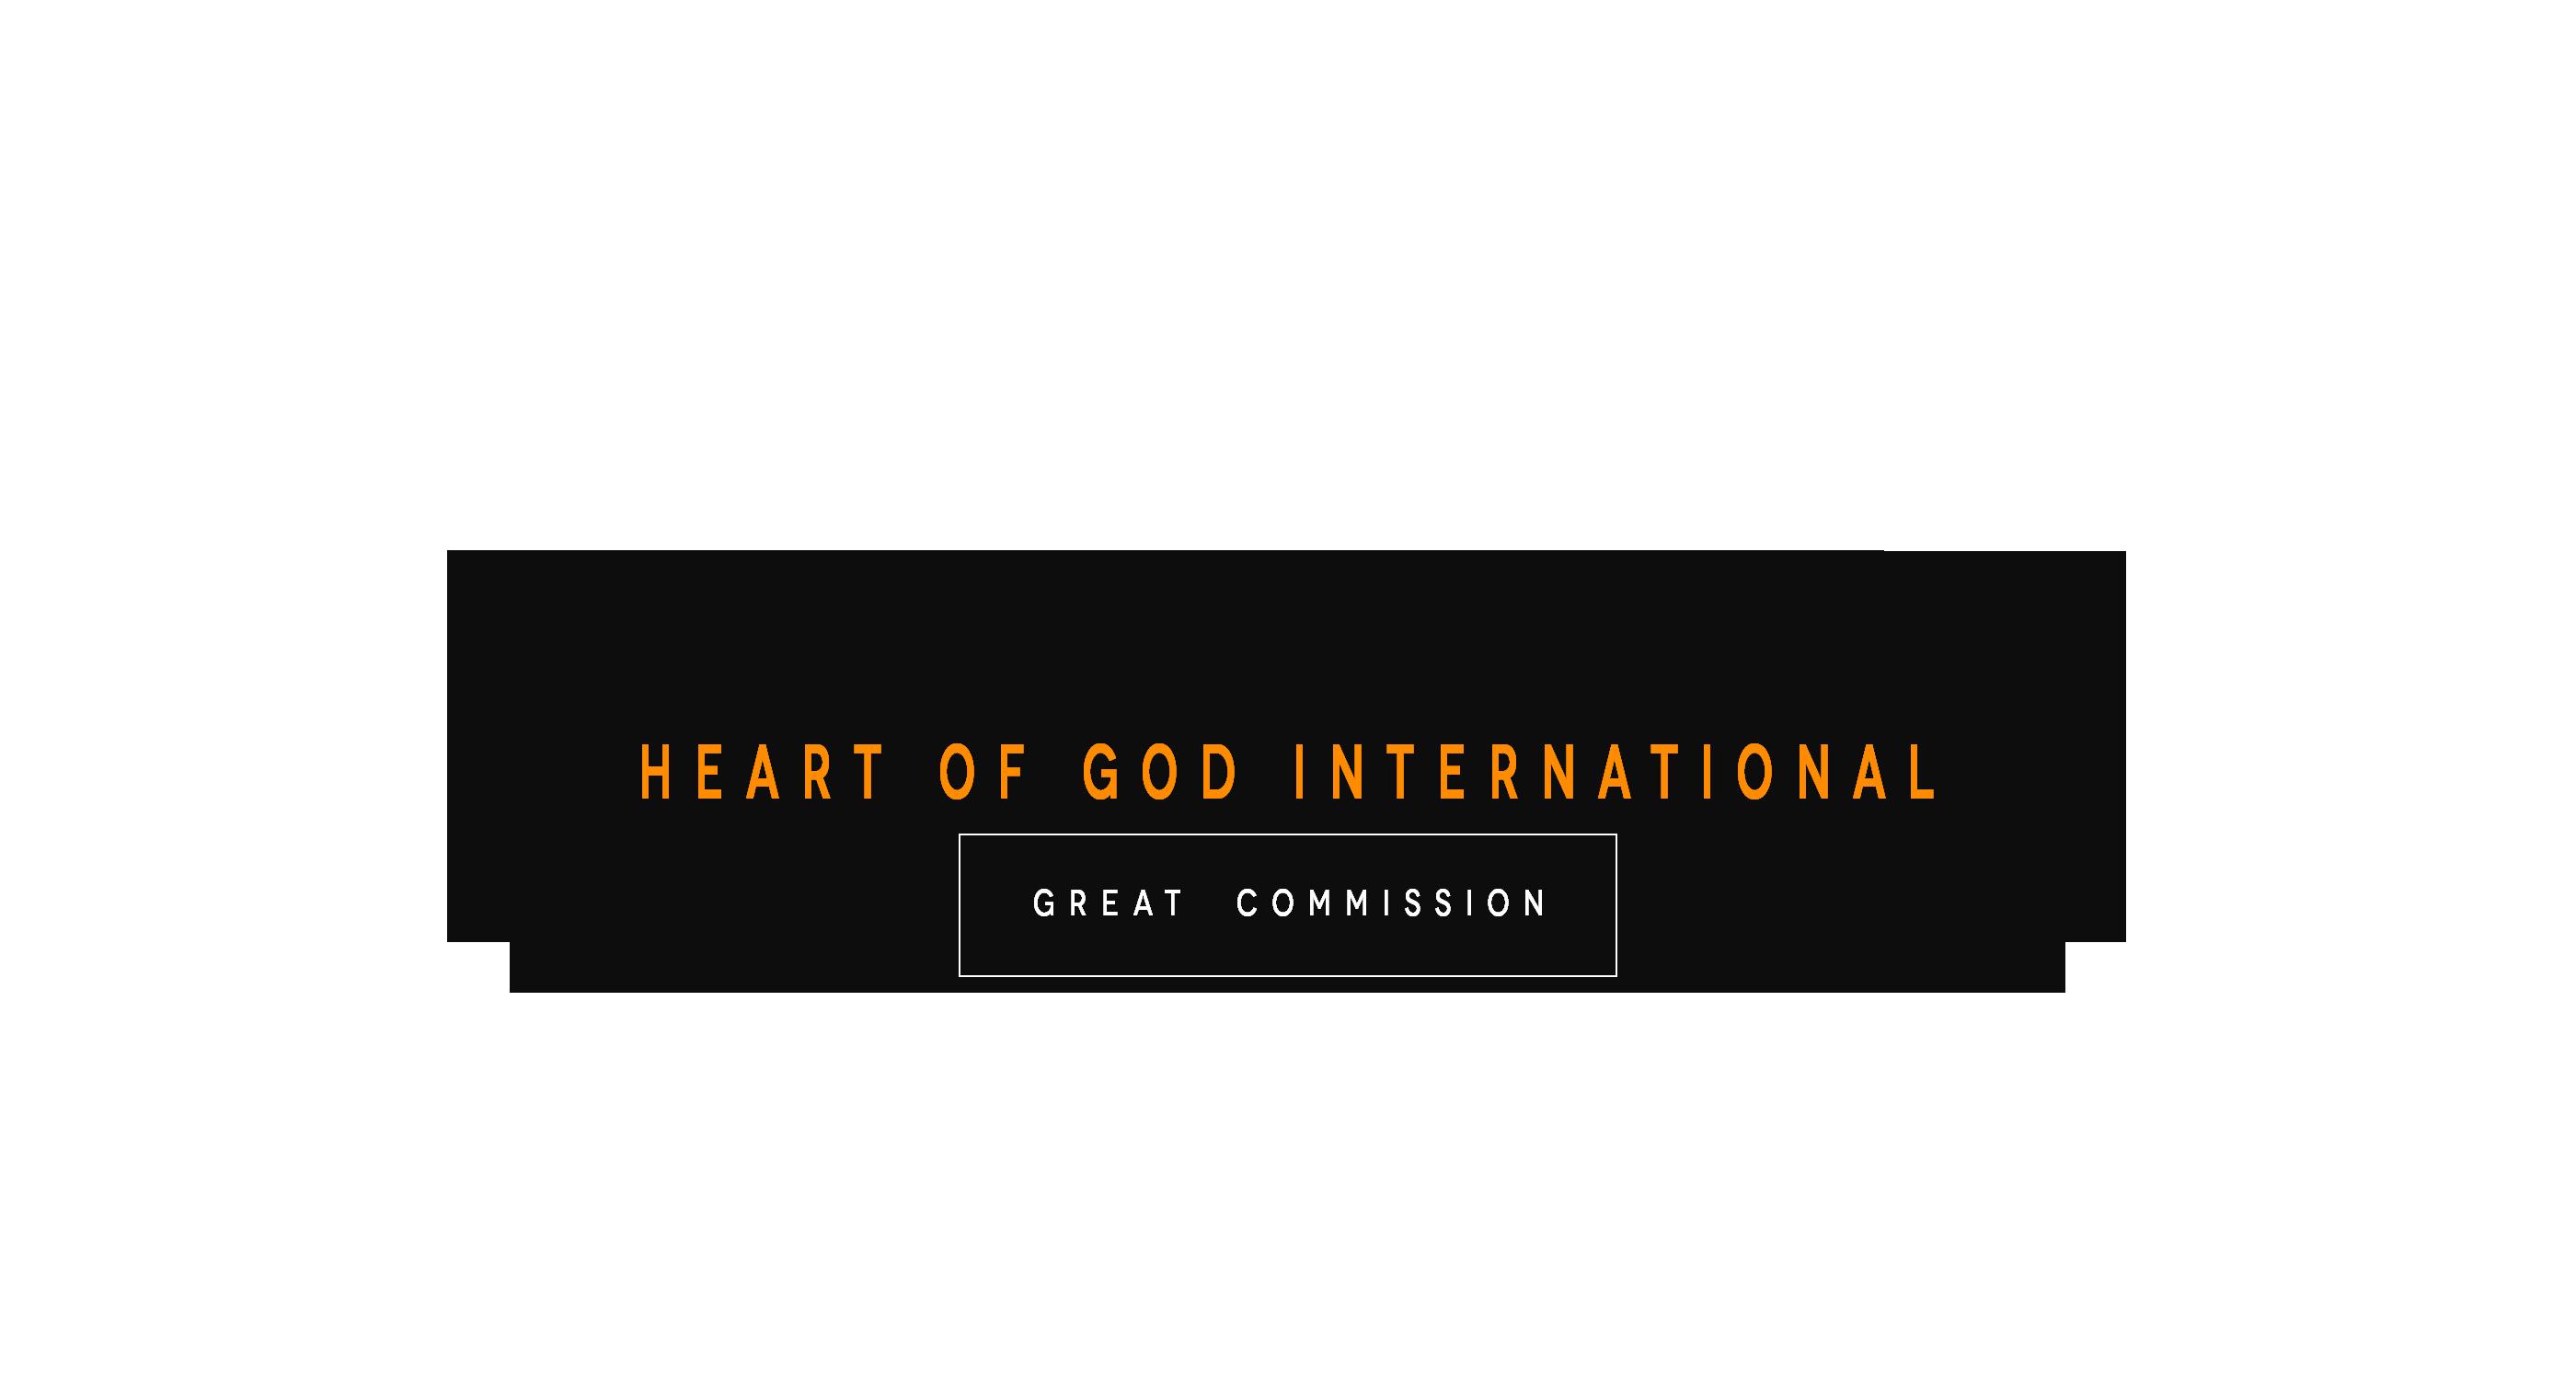 Heart of God International